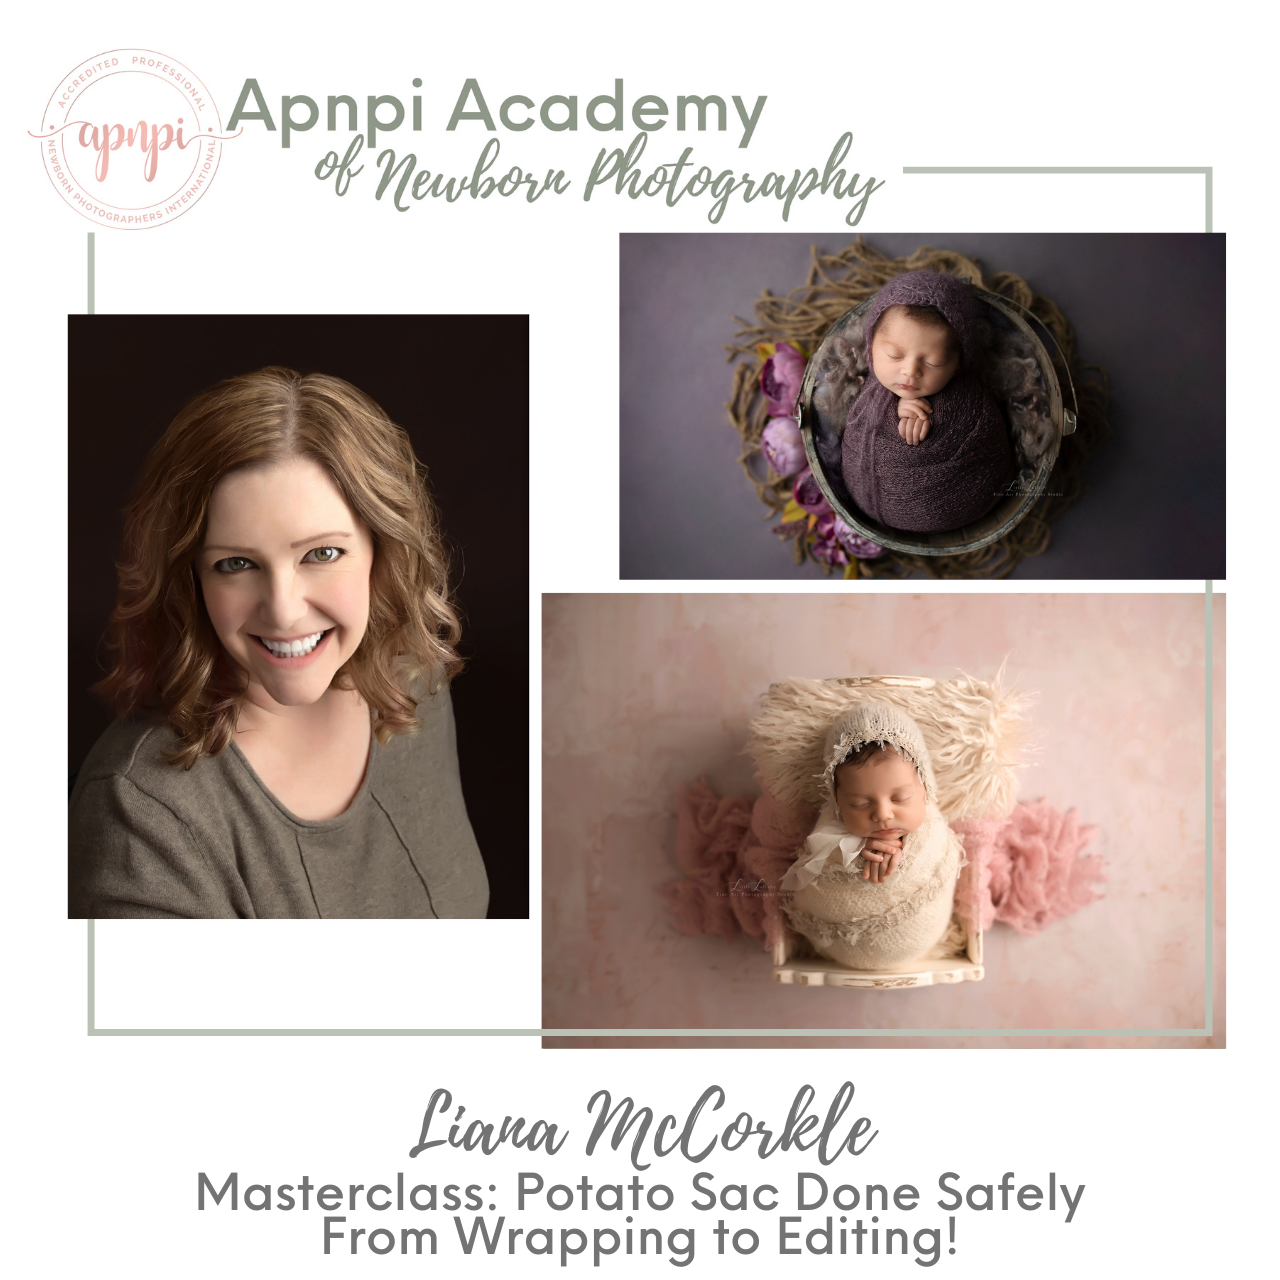 Liana McCorkle Little Lullaby Newborn Photography Potato Sac Safely APNPI Academy Course